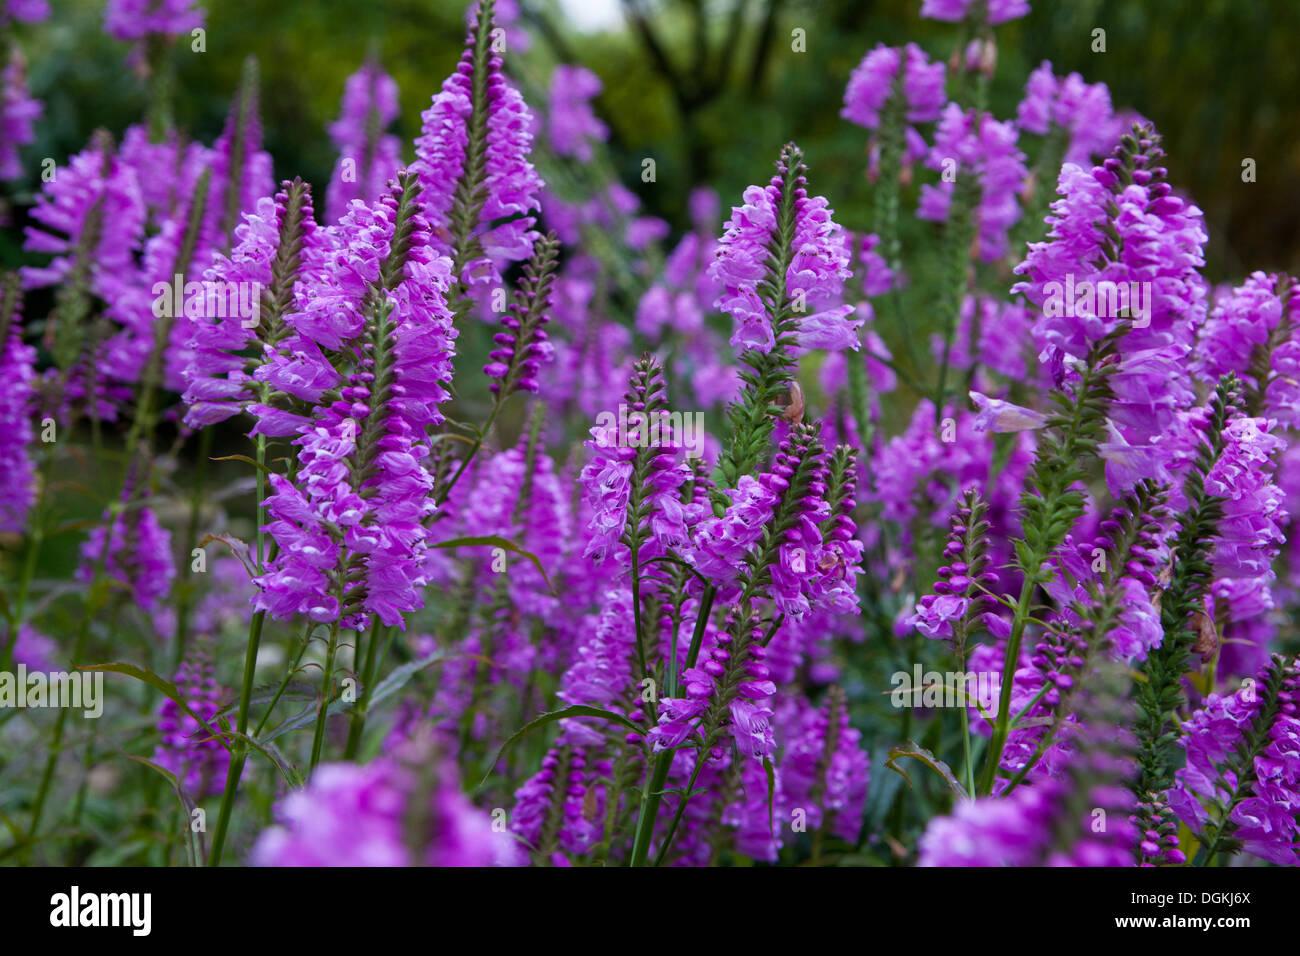 Obedient Plant or False Dragonhead, Physostegia virginiana 'Rosy Spire' - Stock Image